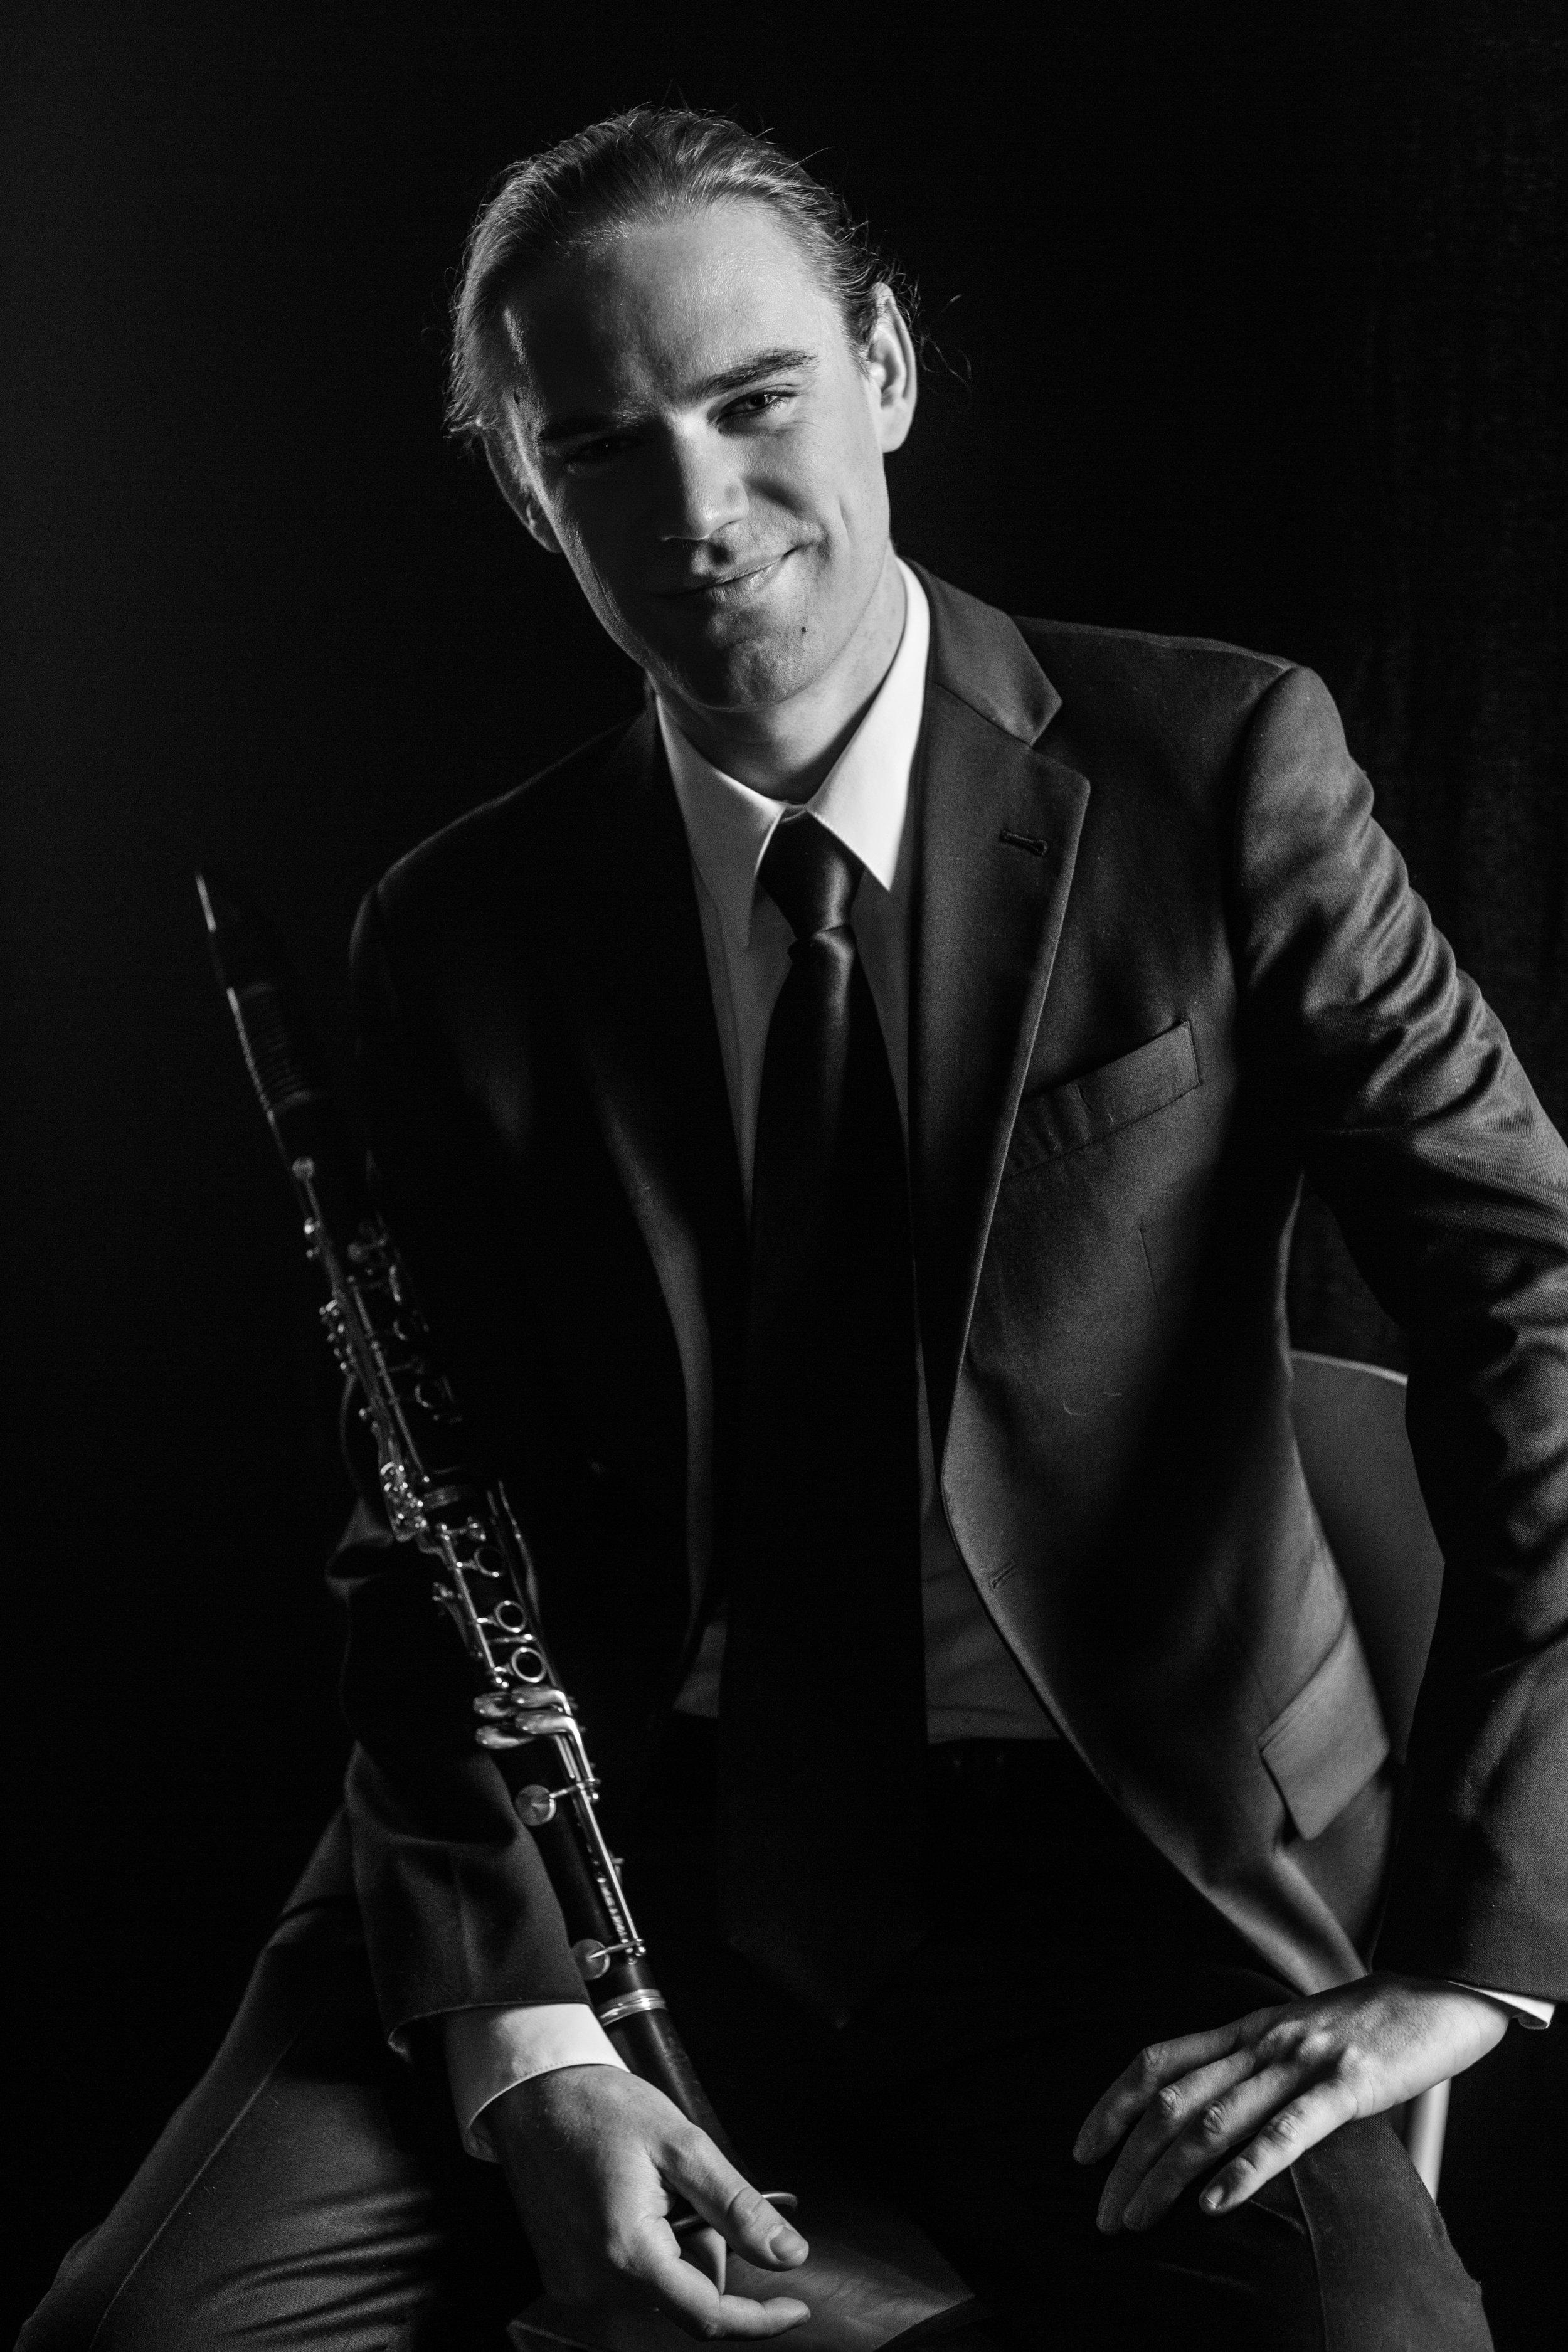 adam_price_clarinet.jpg